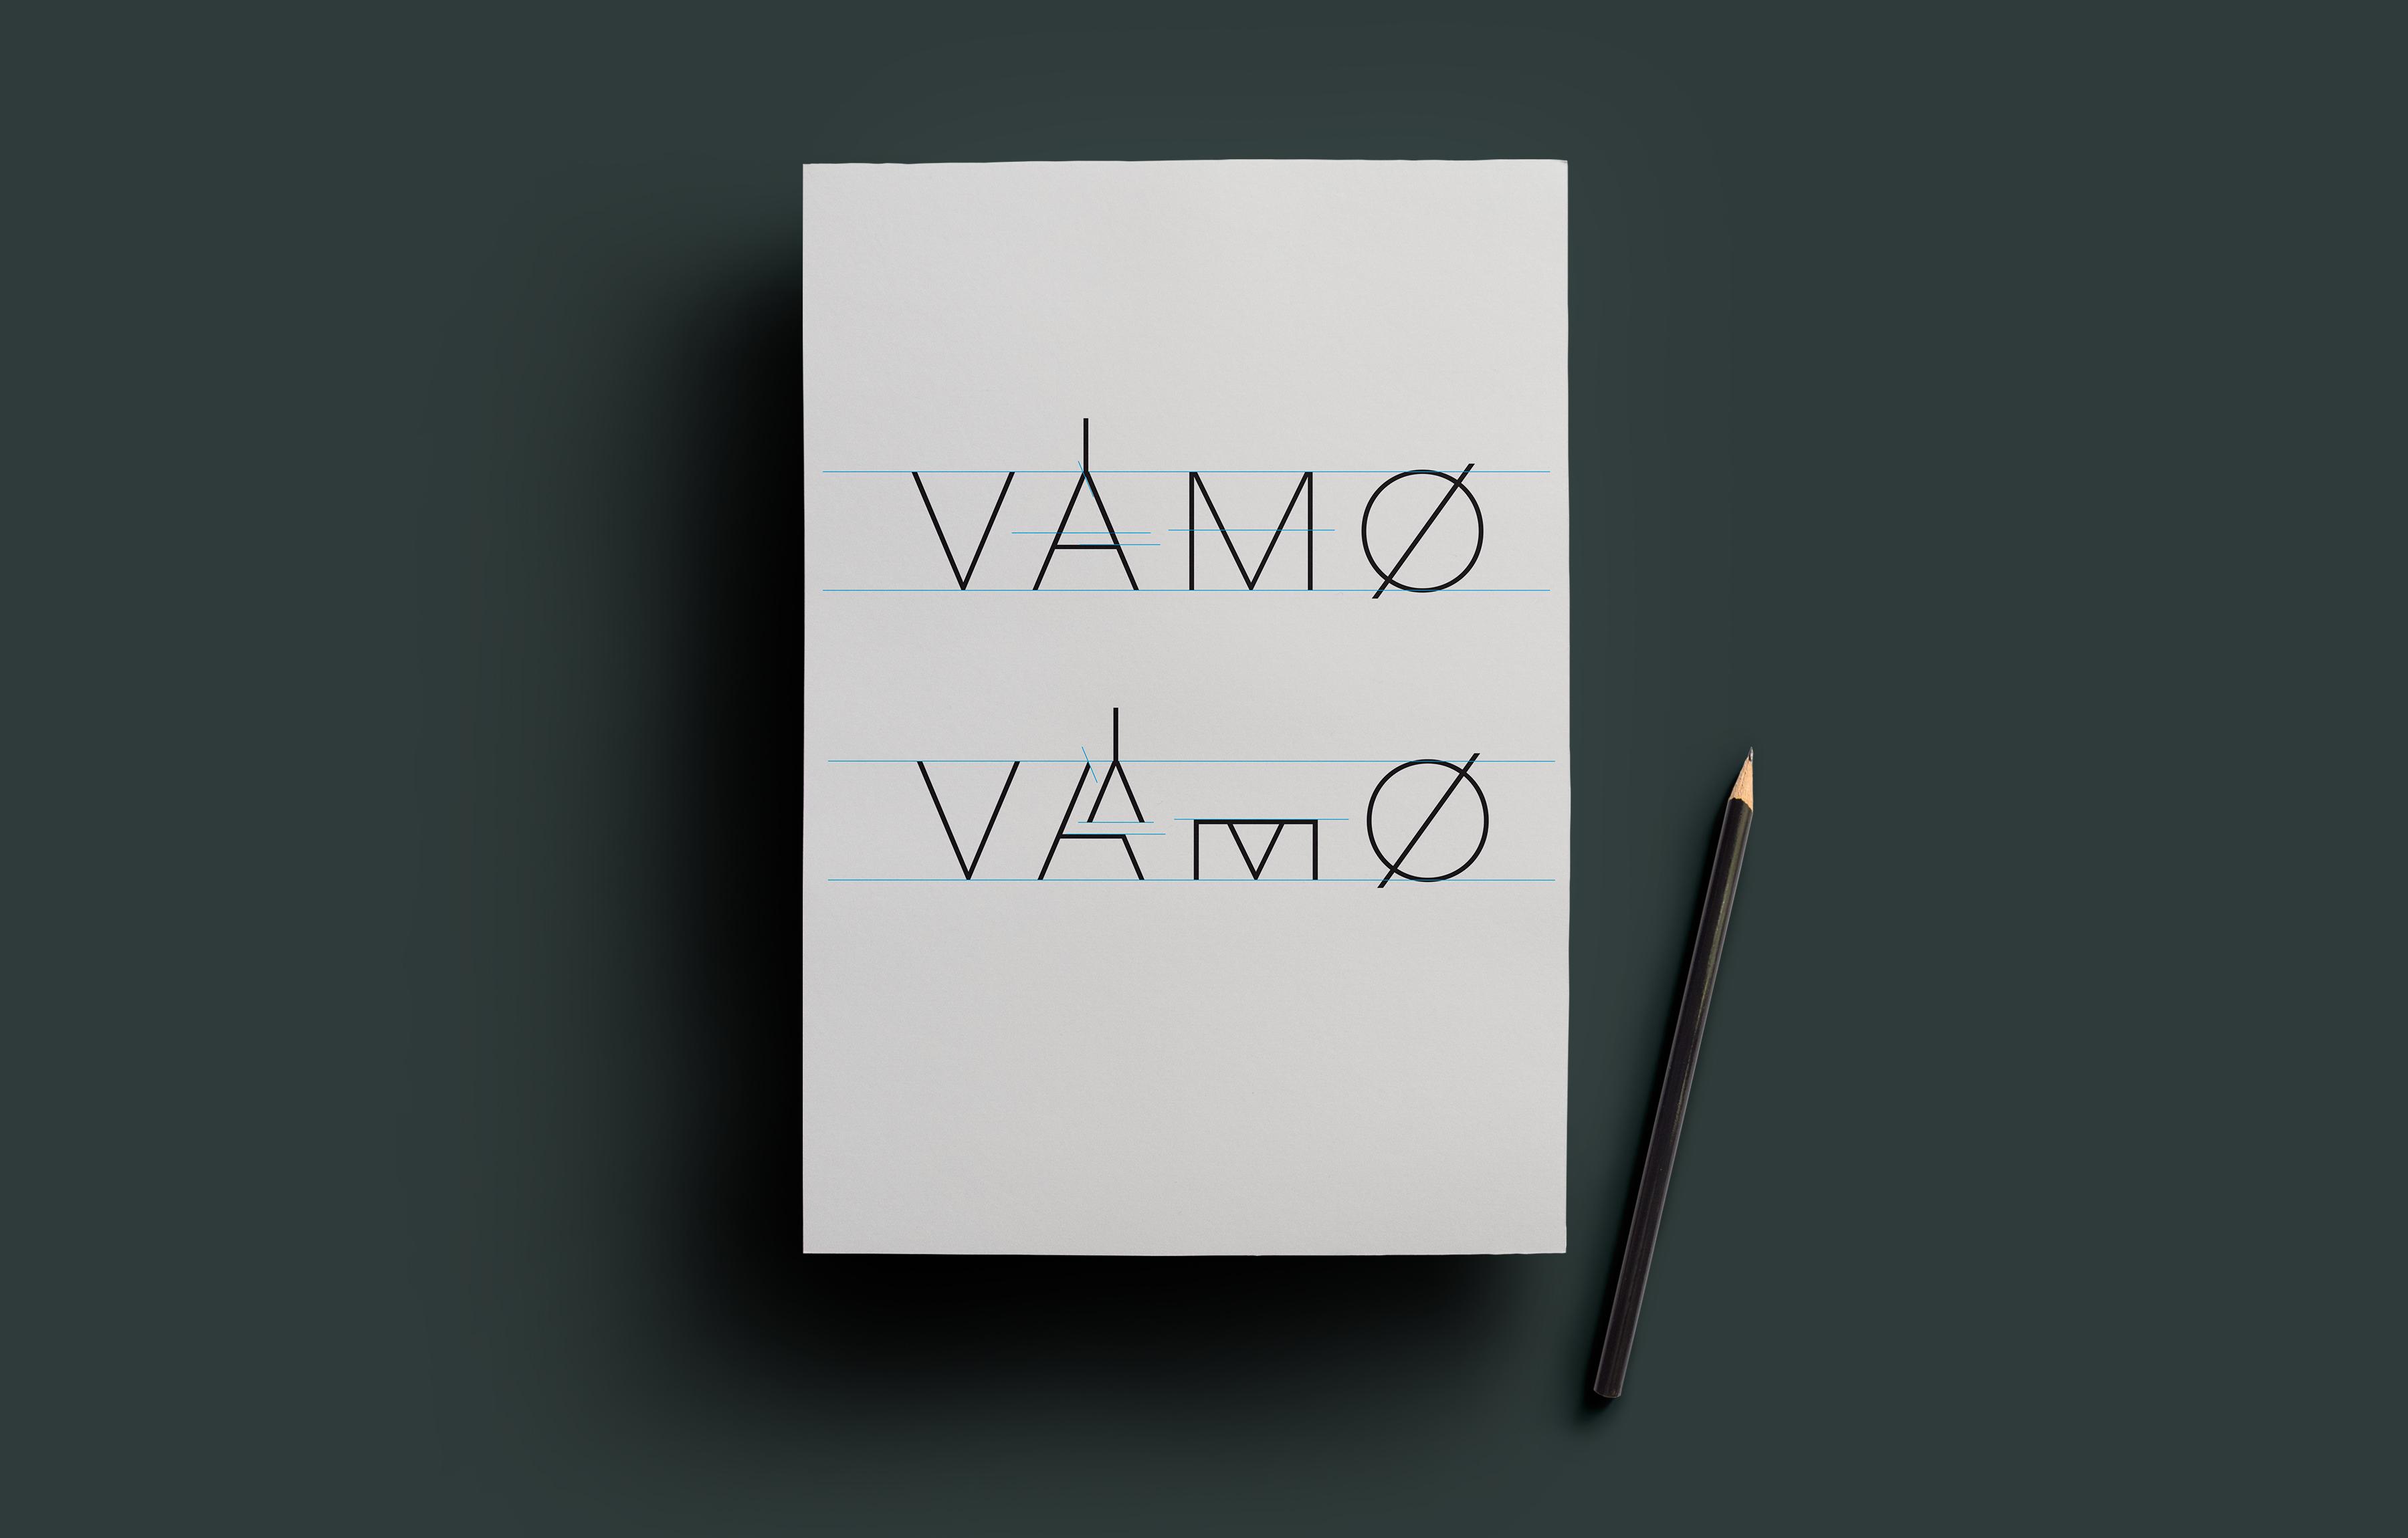 VAMØ Møbler & Interiør logo presentert på ark